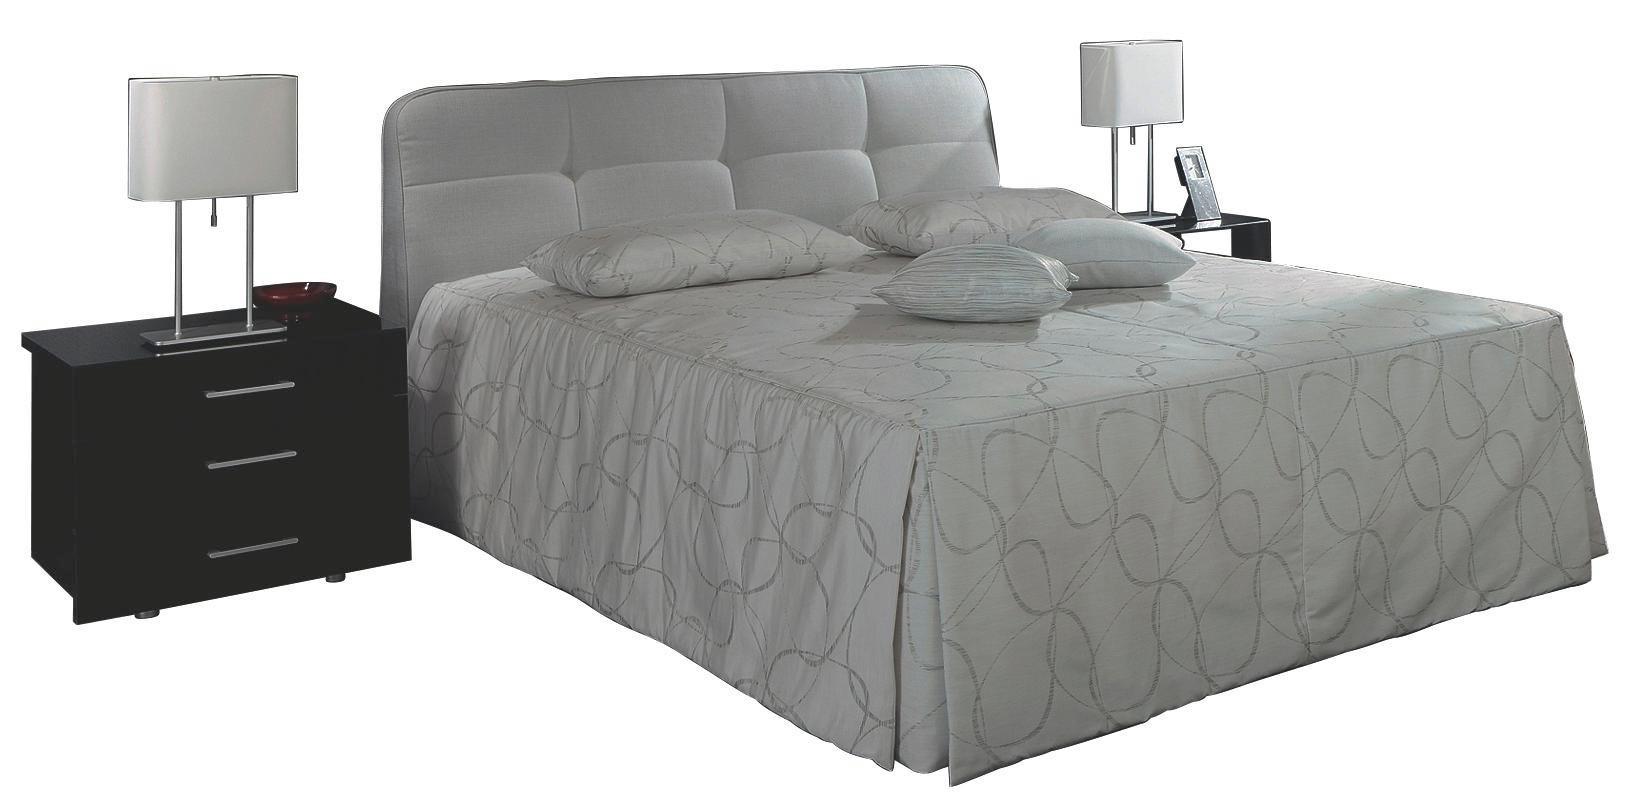 POLSTERBETT 200/200 cm - Grau, Basics, Textil (200/200cm) - RUF